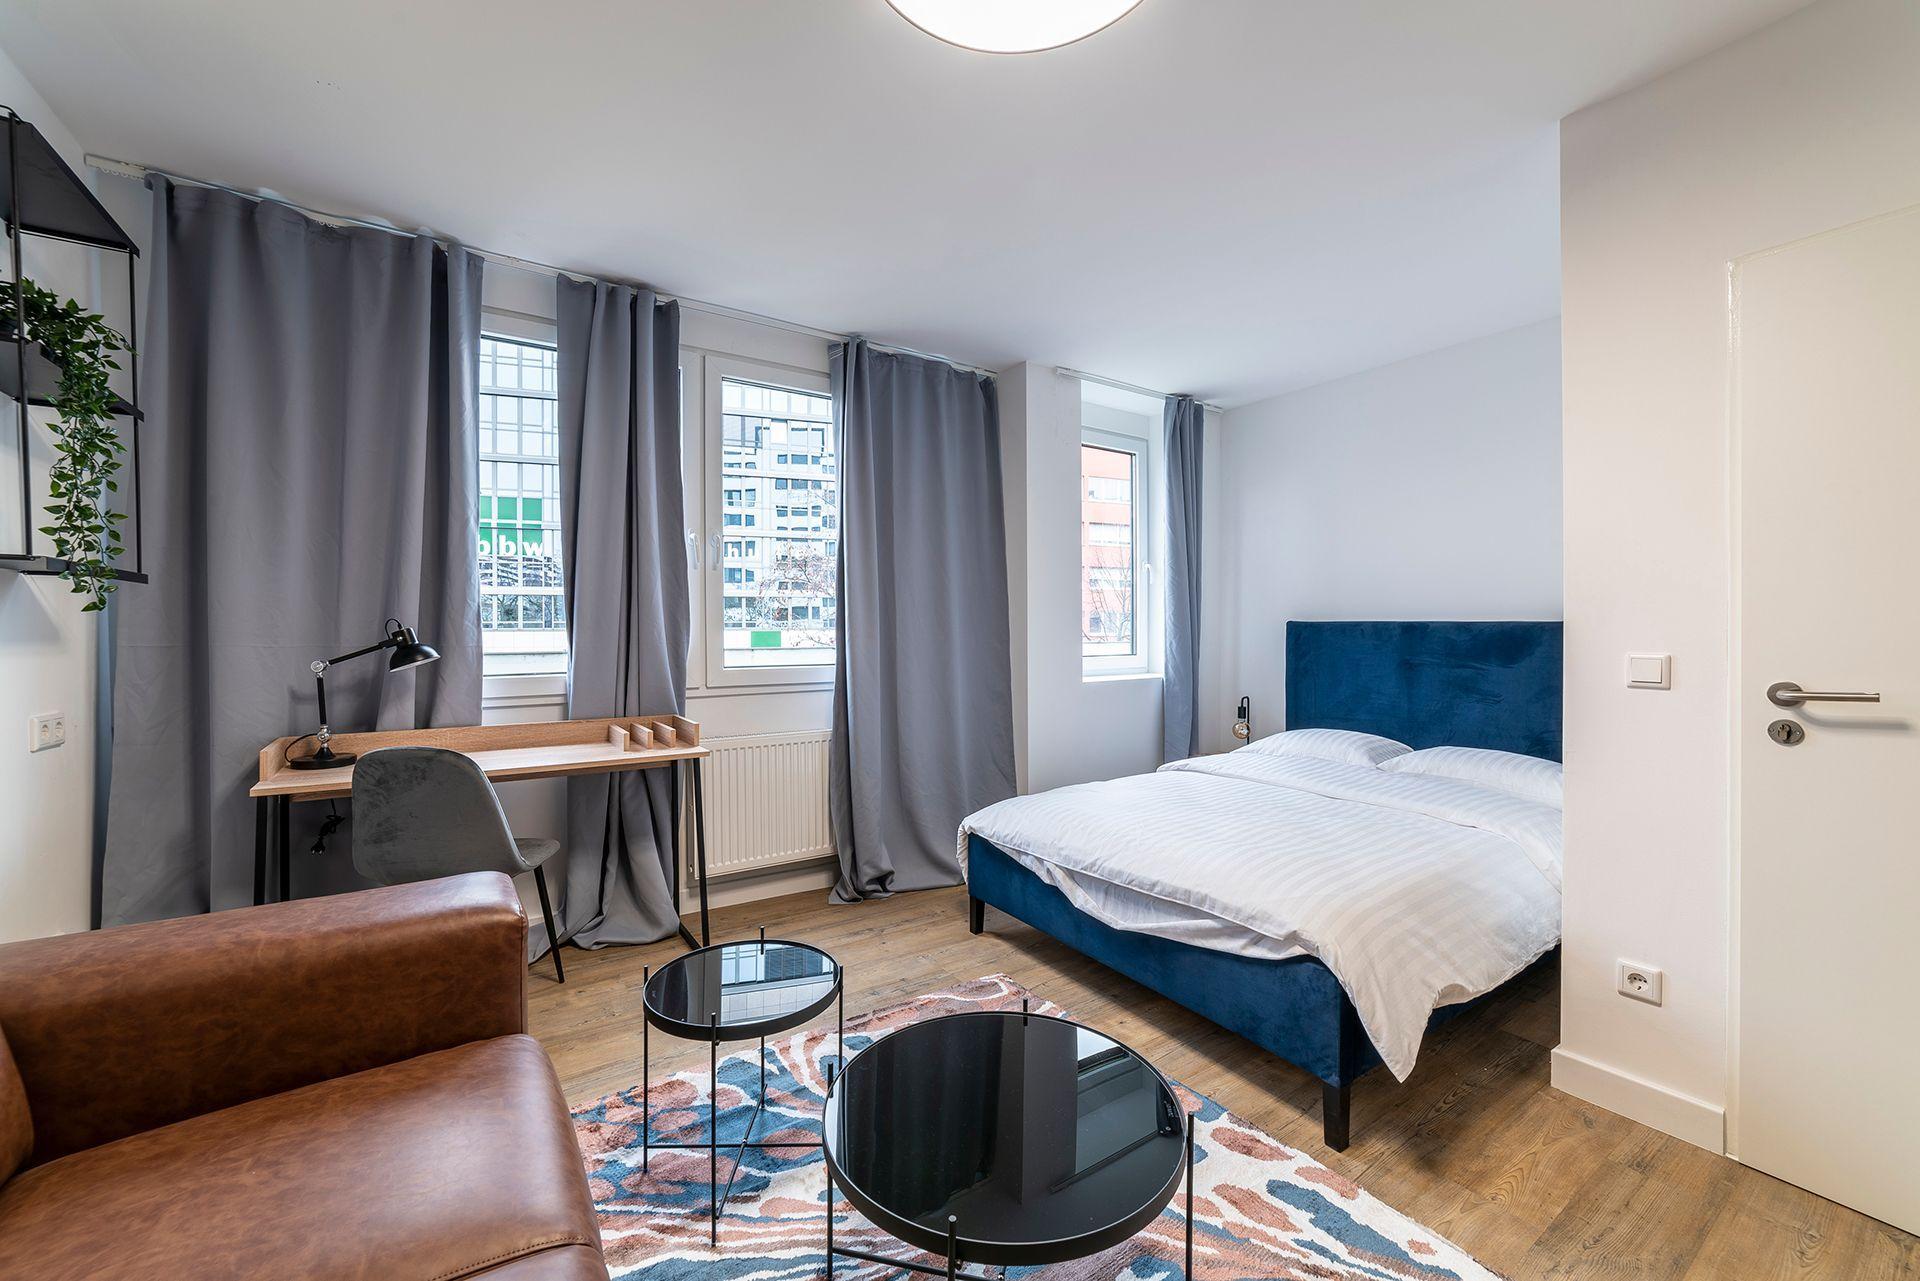 Private Room - Medium apartment to rent in Berlin BILE-LE96-1061-2